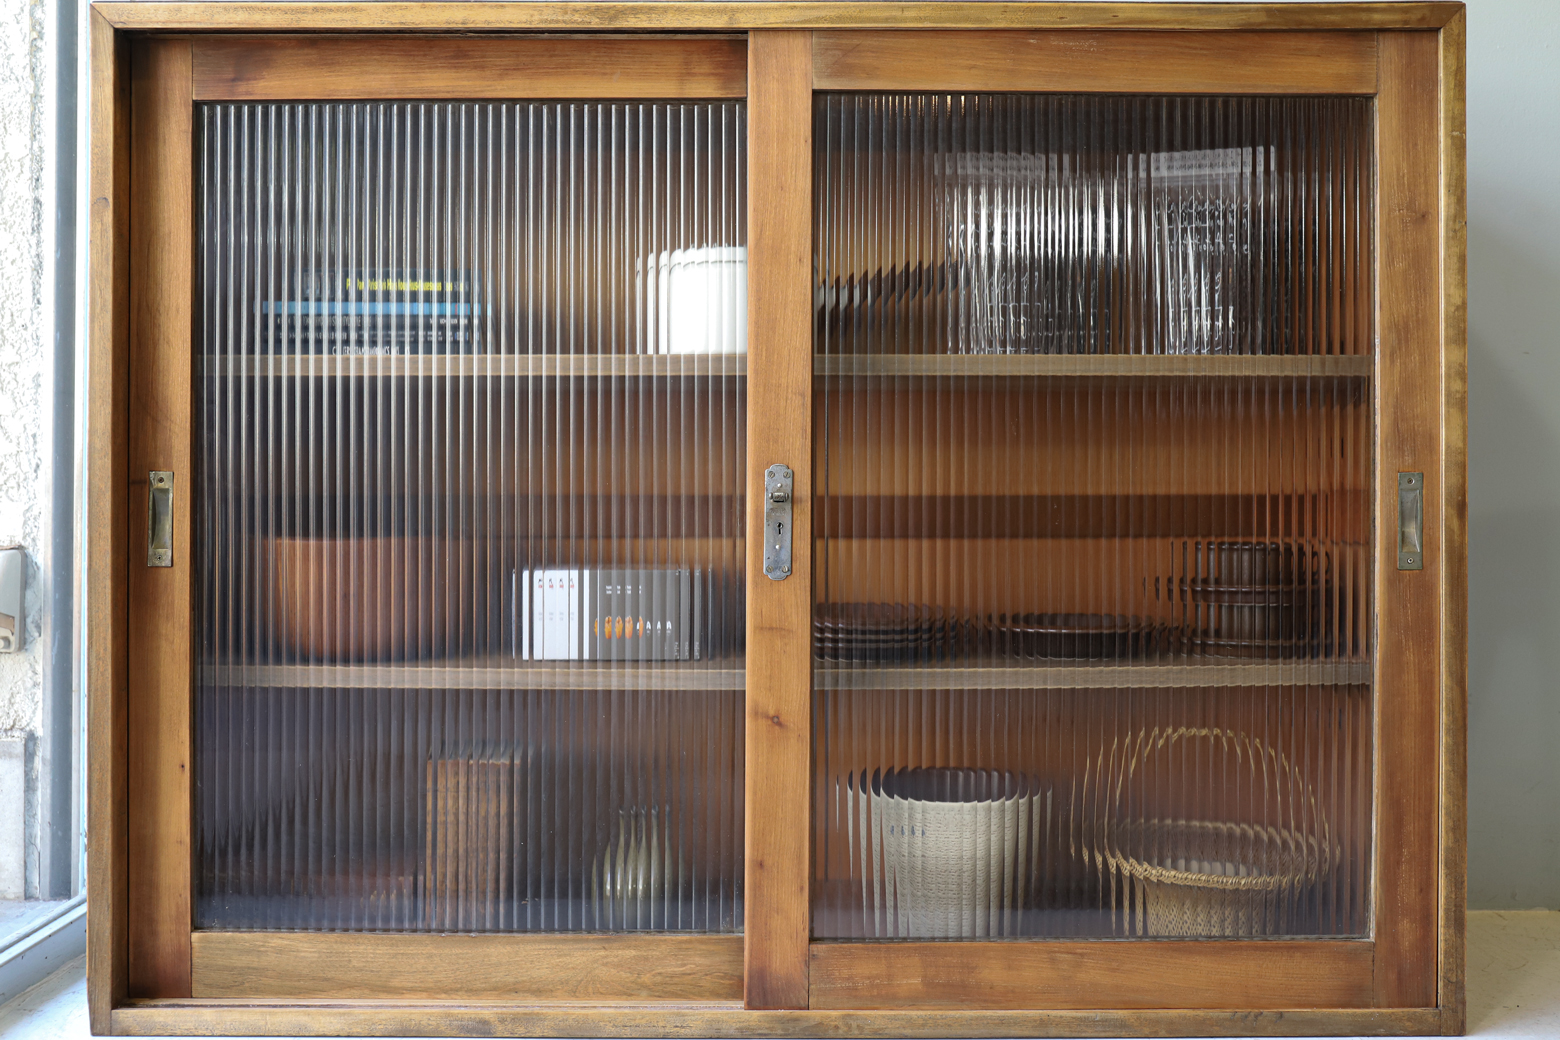 Antique Reeded Glass Case/アンティークモールガラス ケース 本棚 食器棚